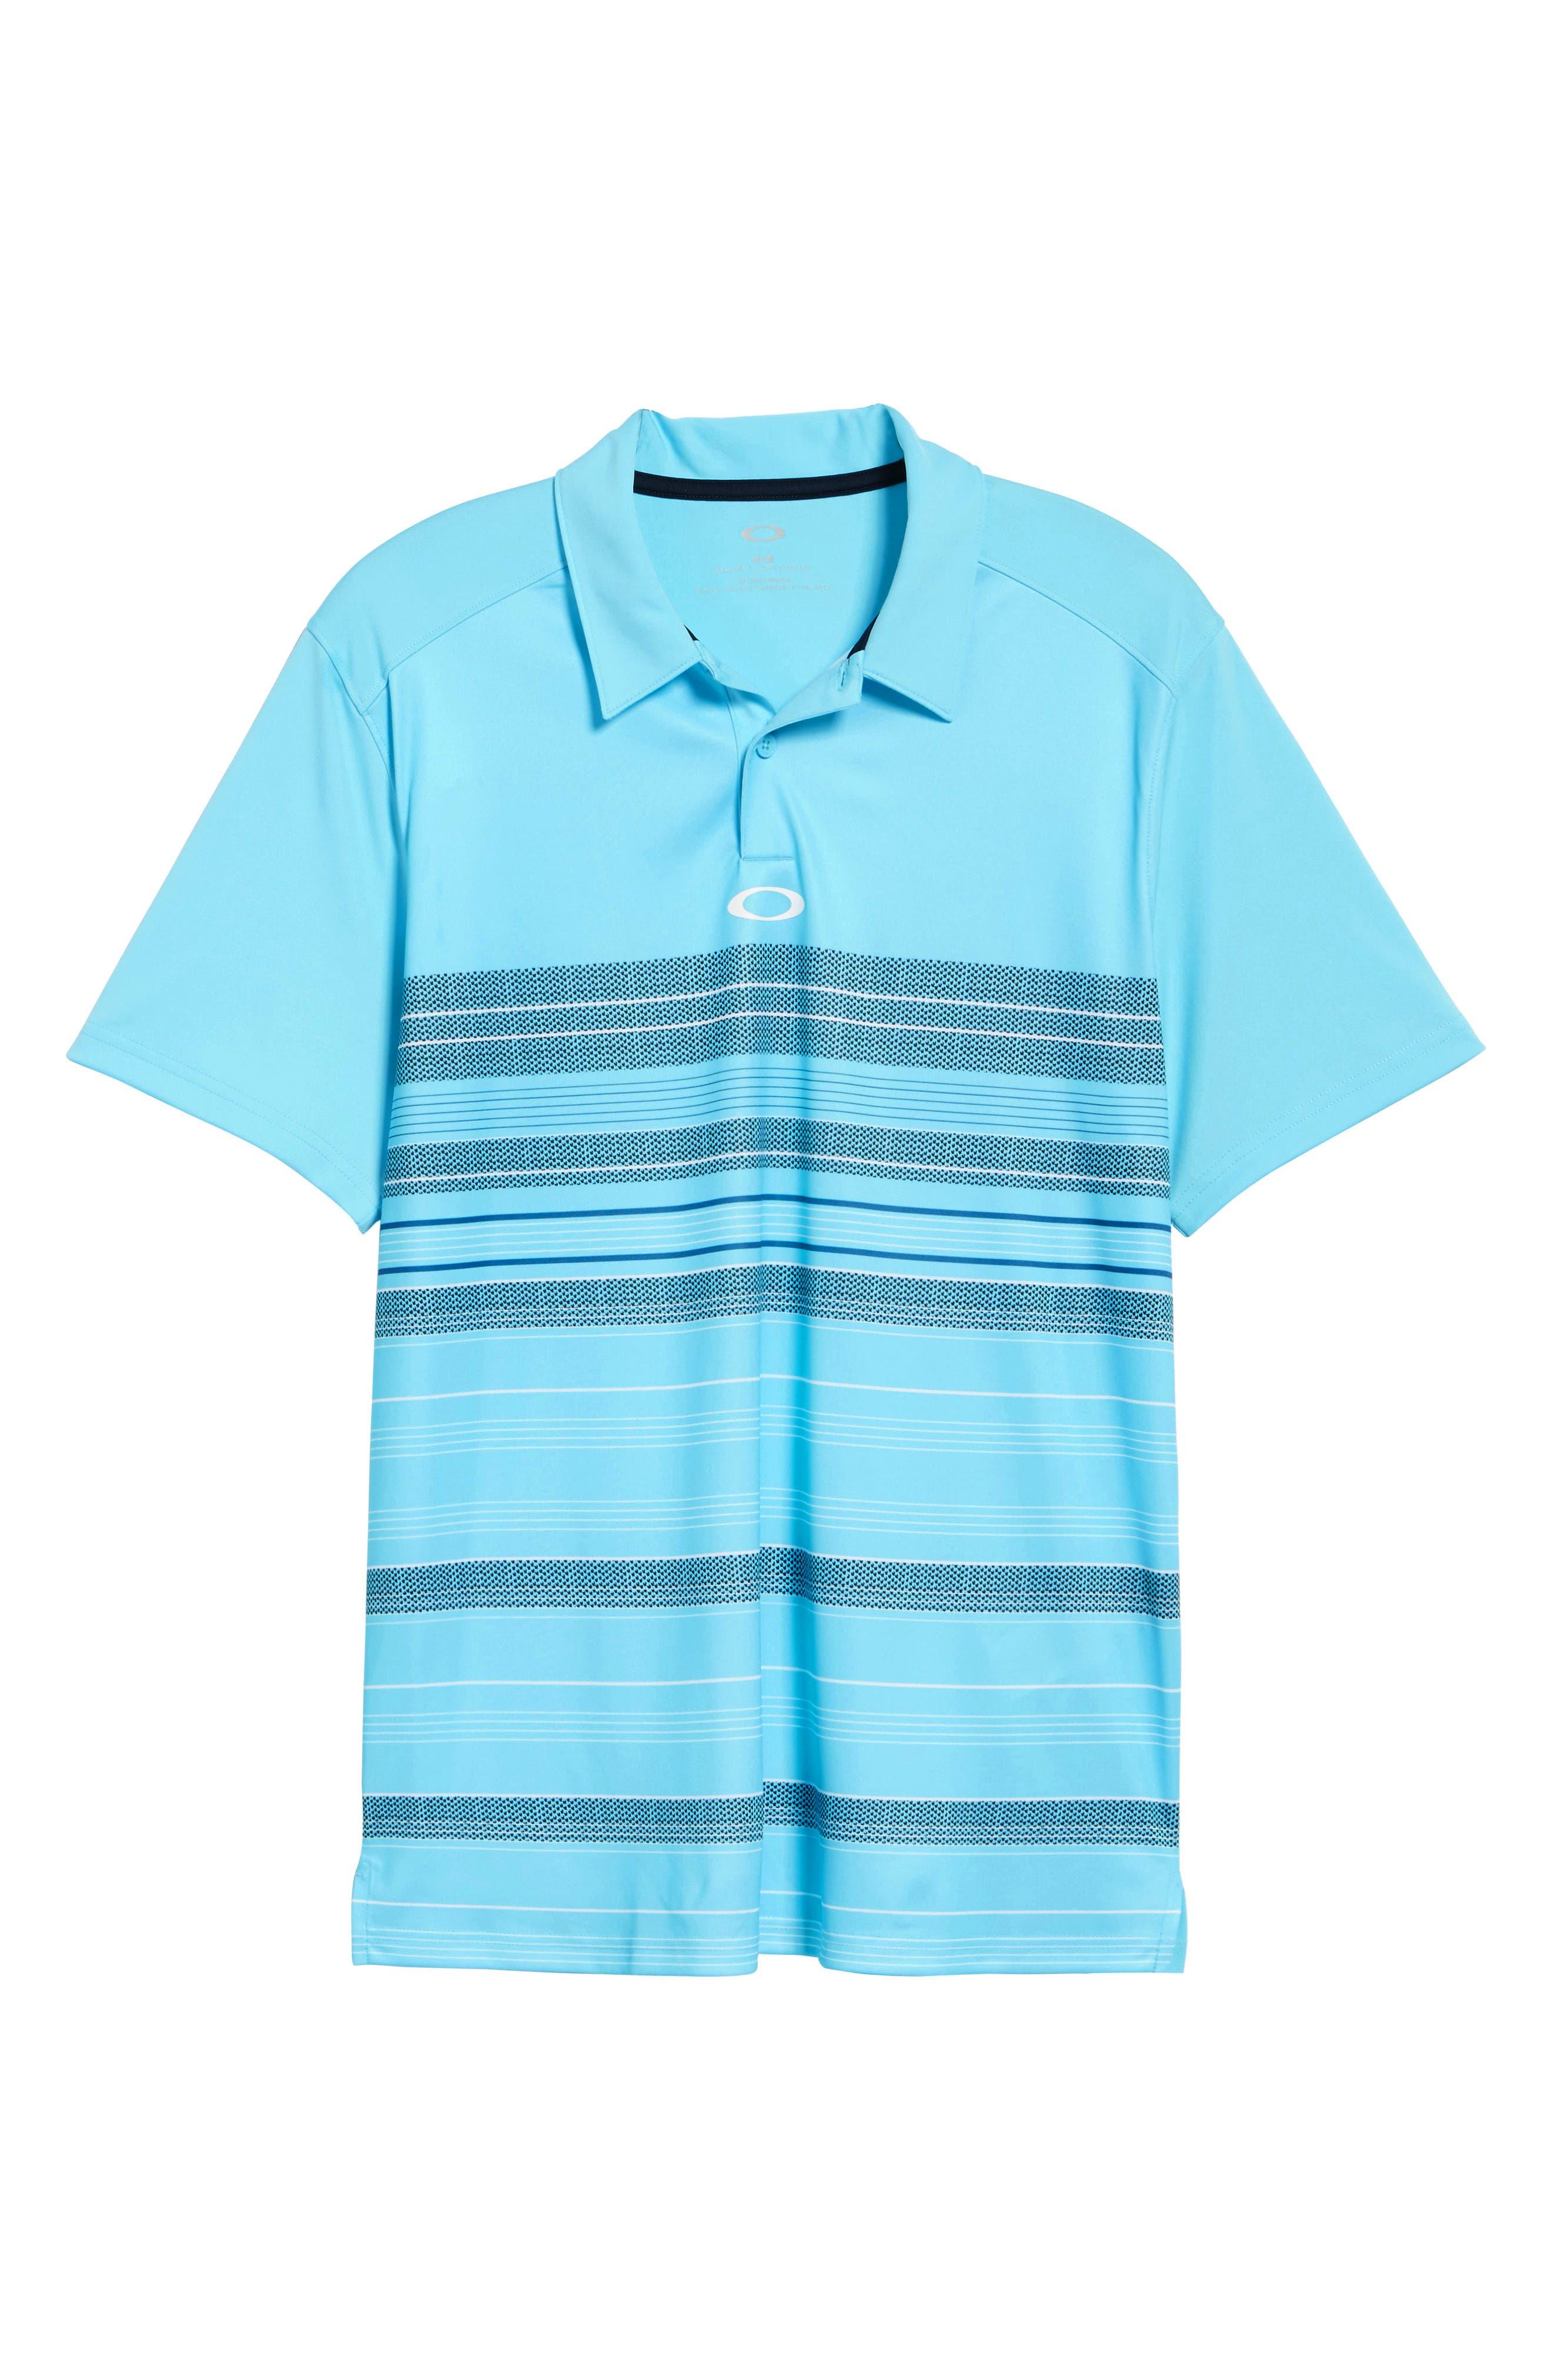 High Crest Polo Shirt,                             Alternate thumbnail 23, color,